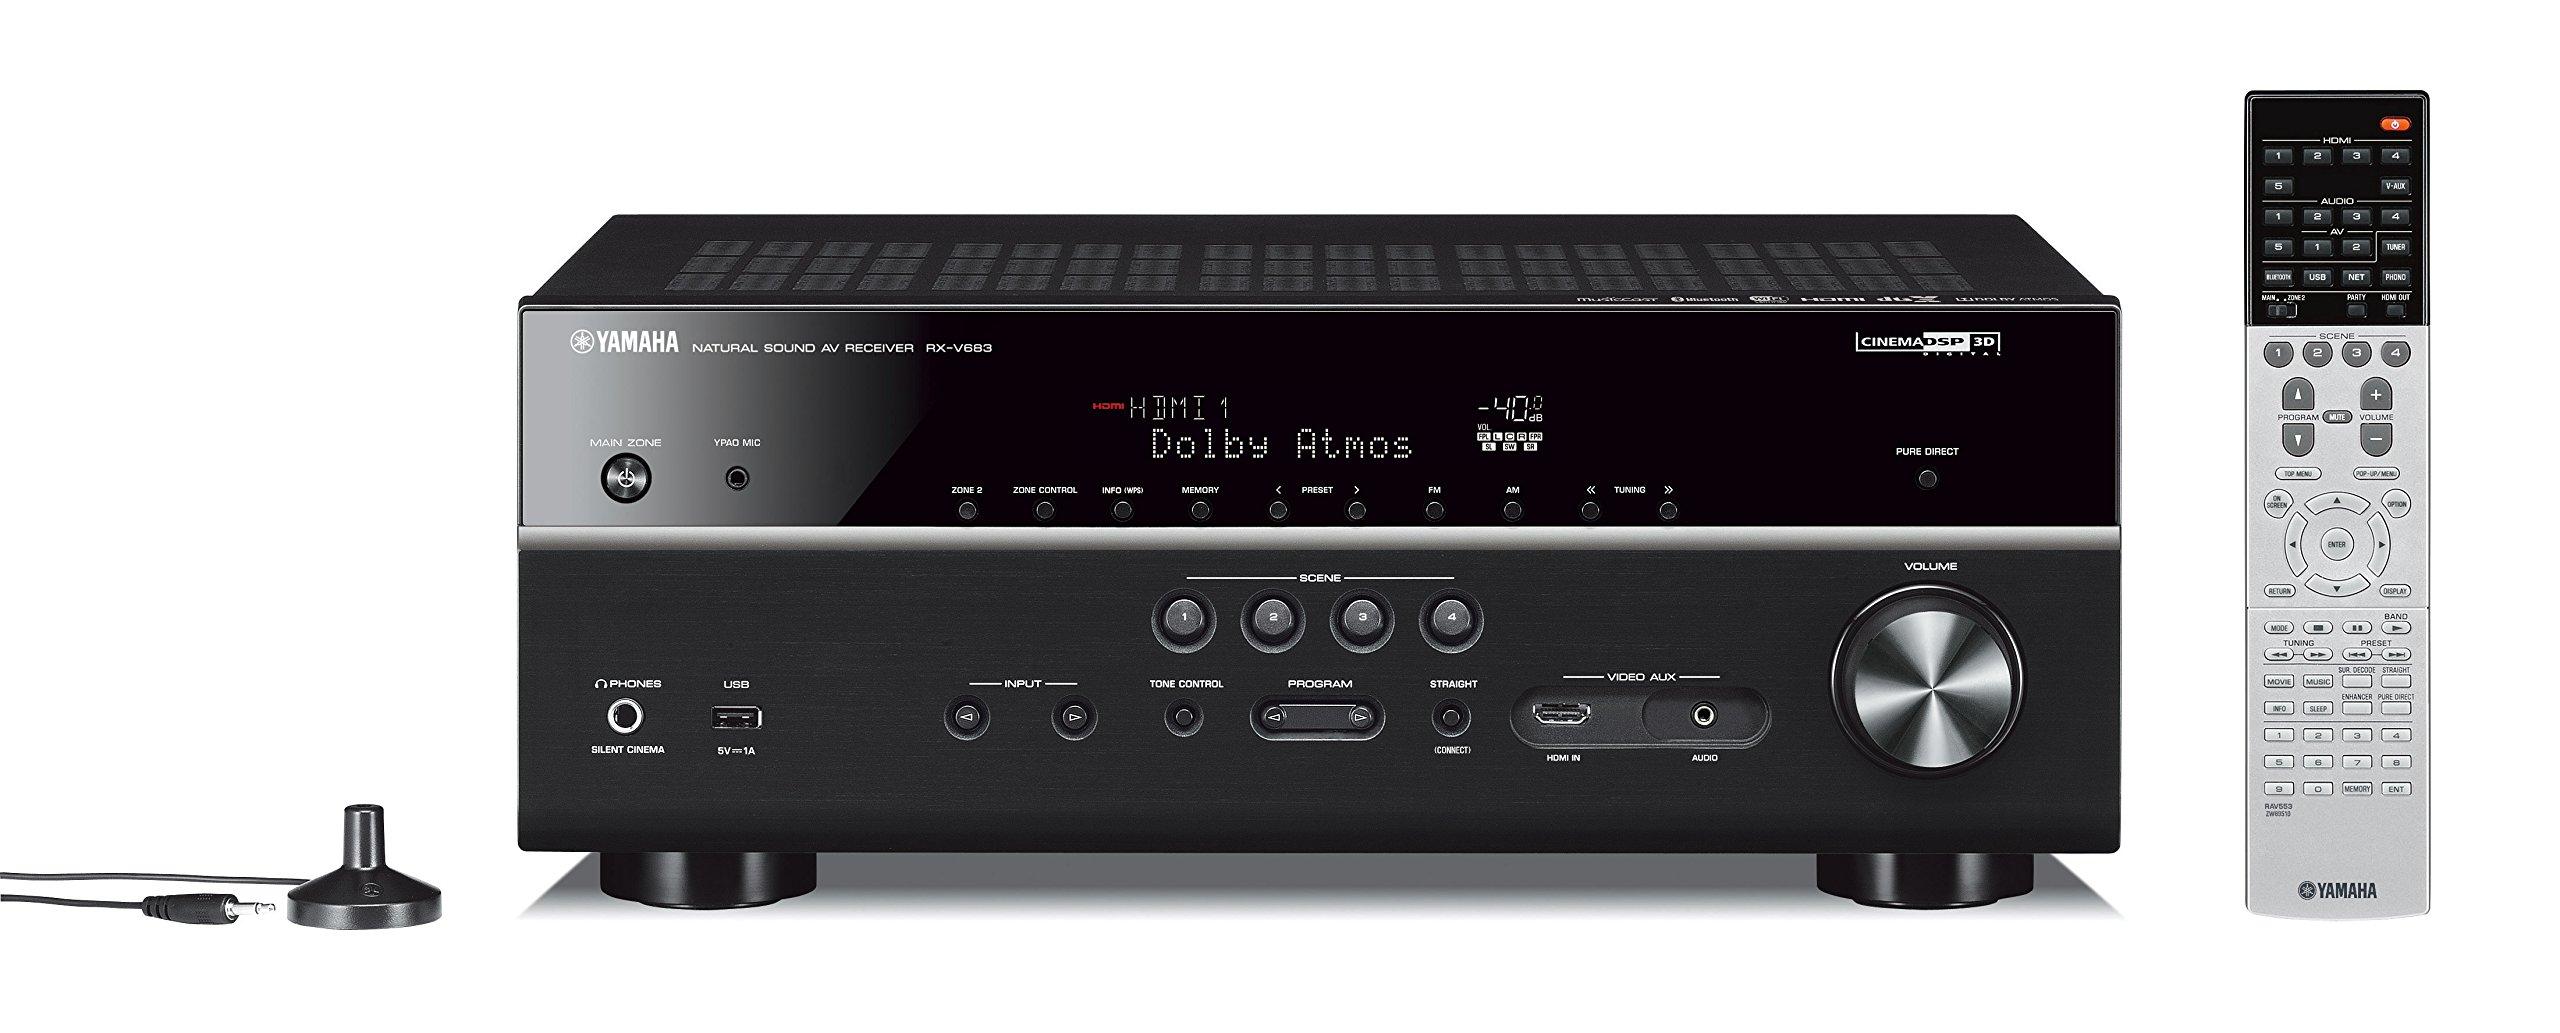 Yamaha RX V683BL 7 2 Channel MusicCast Bluetooth